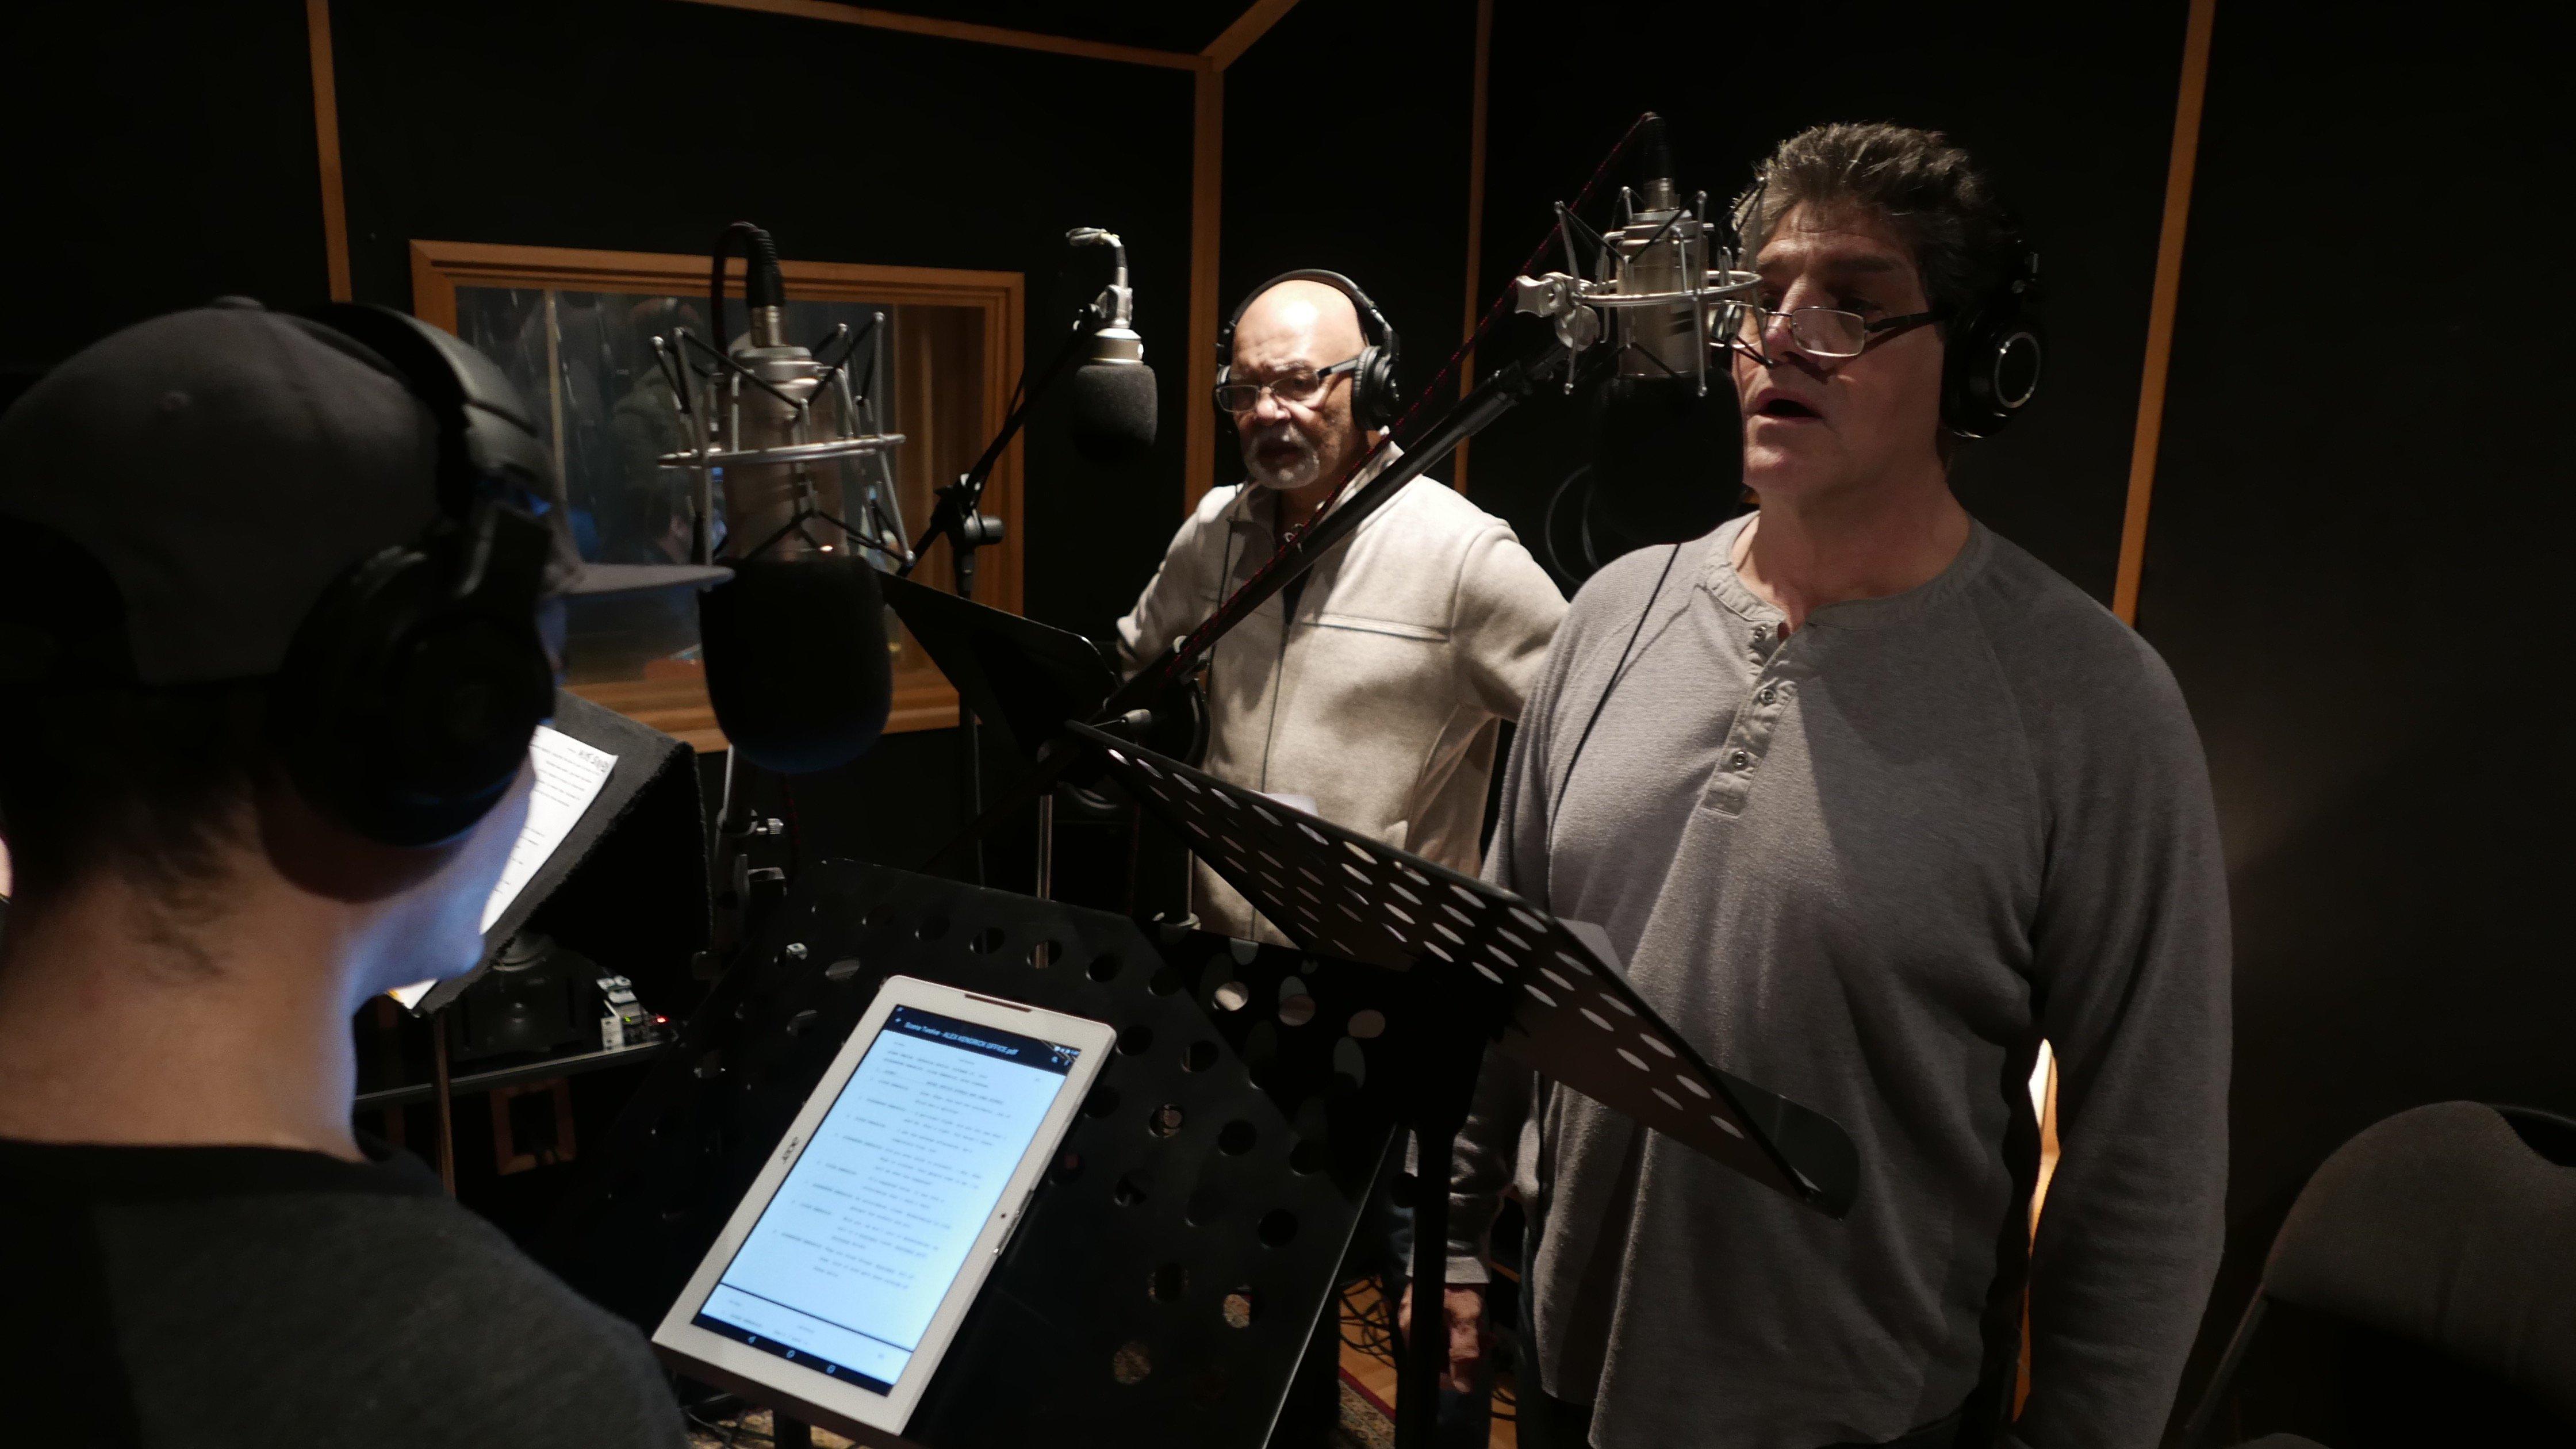 Bitter Air, Recording Studio Image, February 2017.